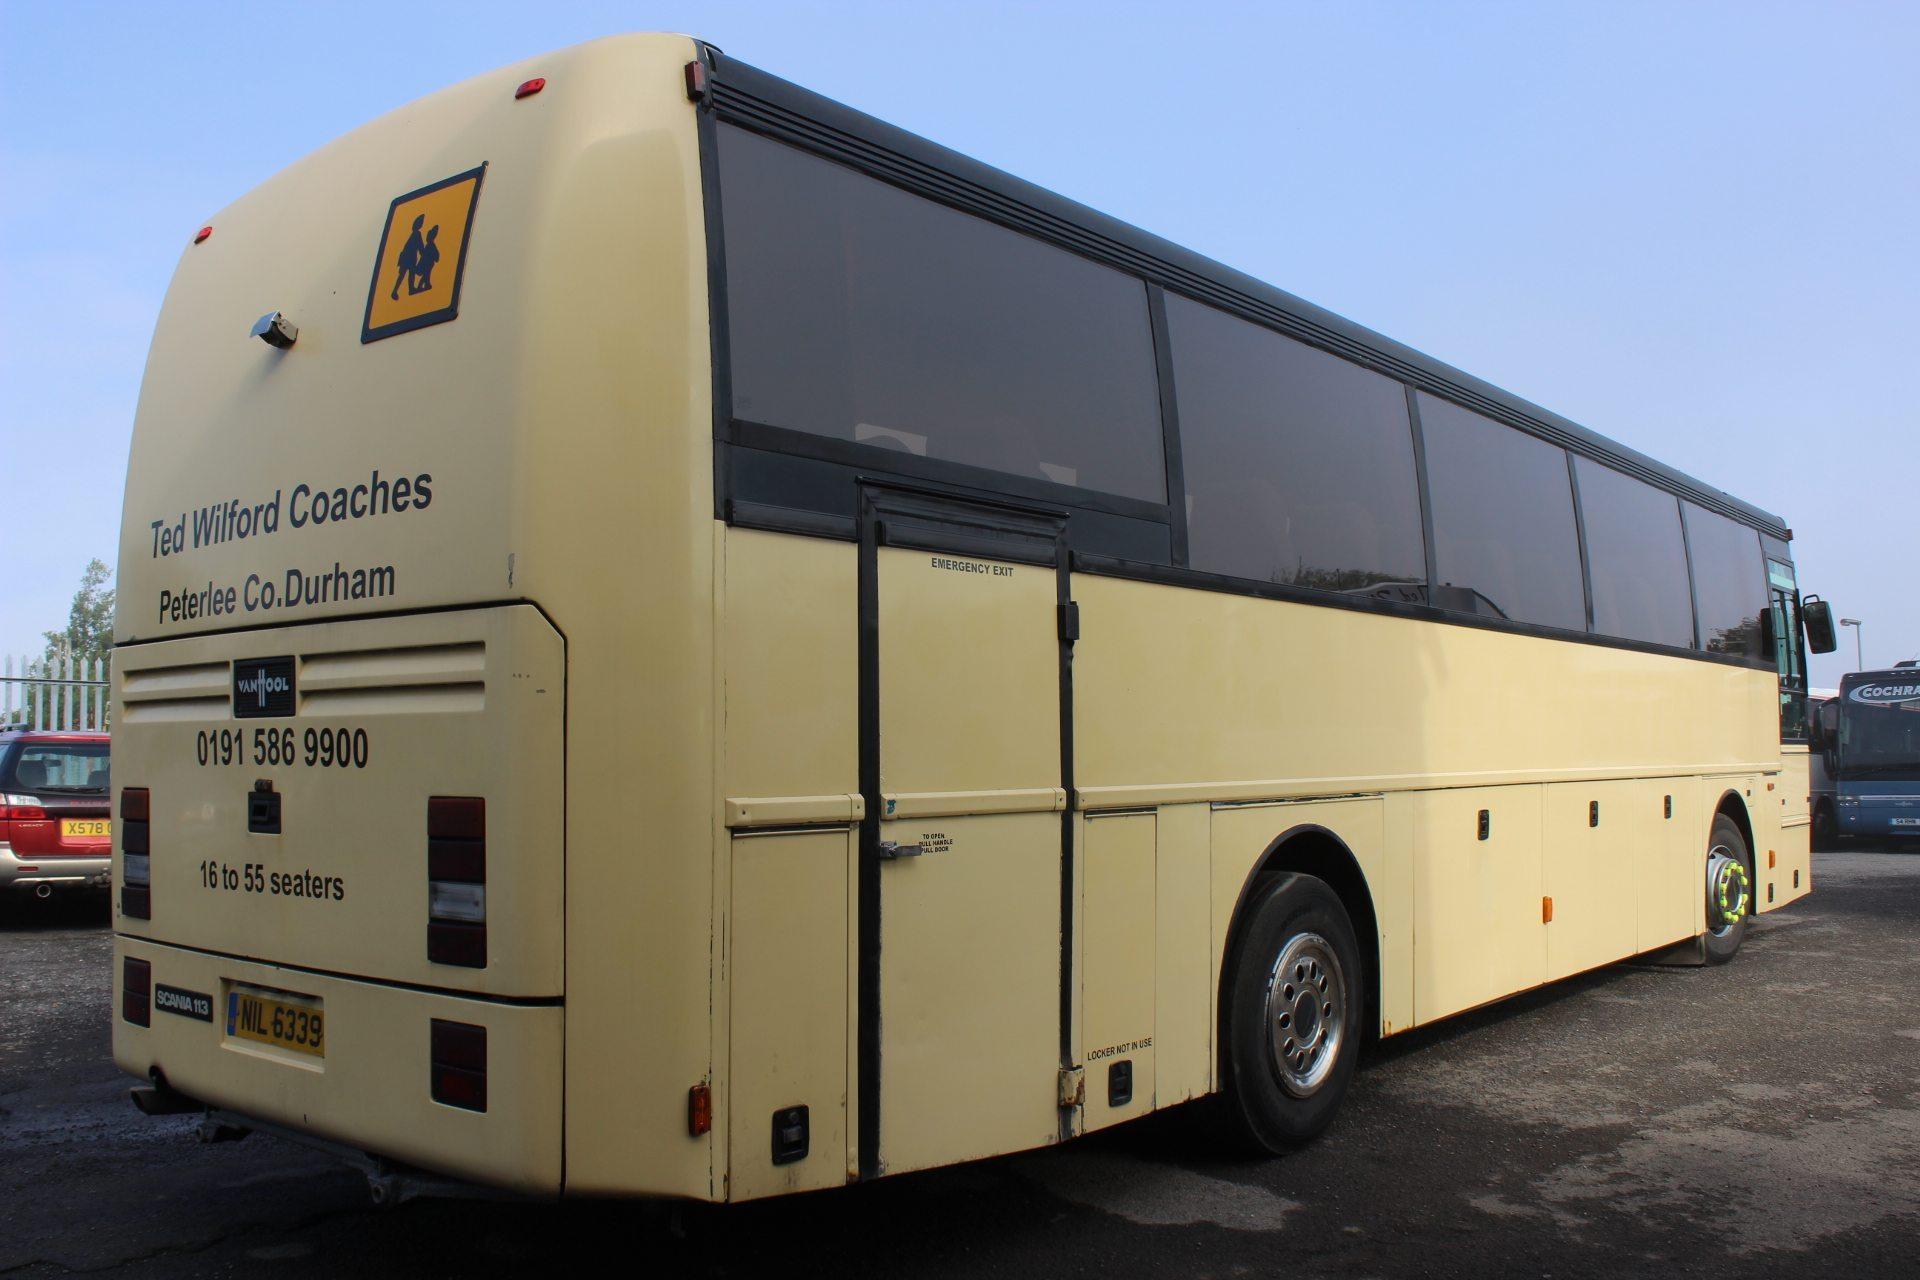 94 Scania K113 Van Hool Alizee 49 Seats Hills Coaches